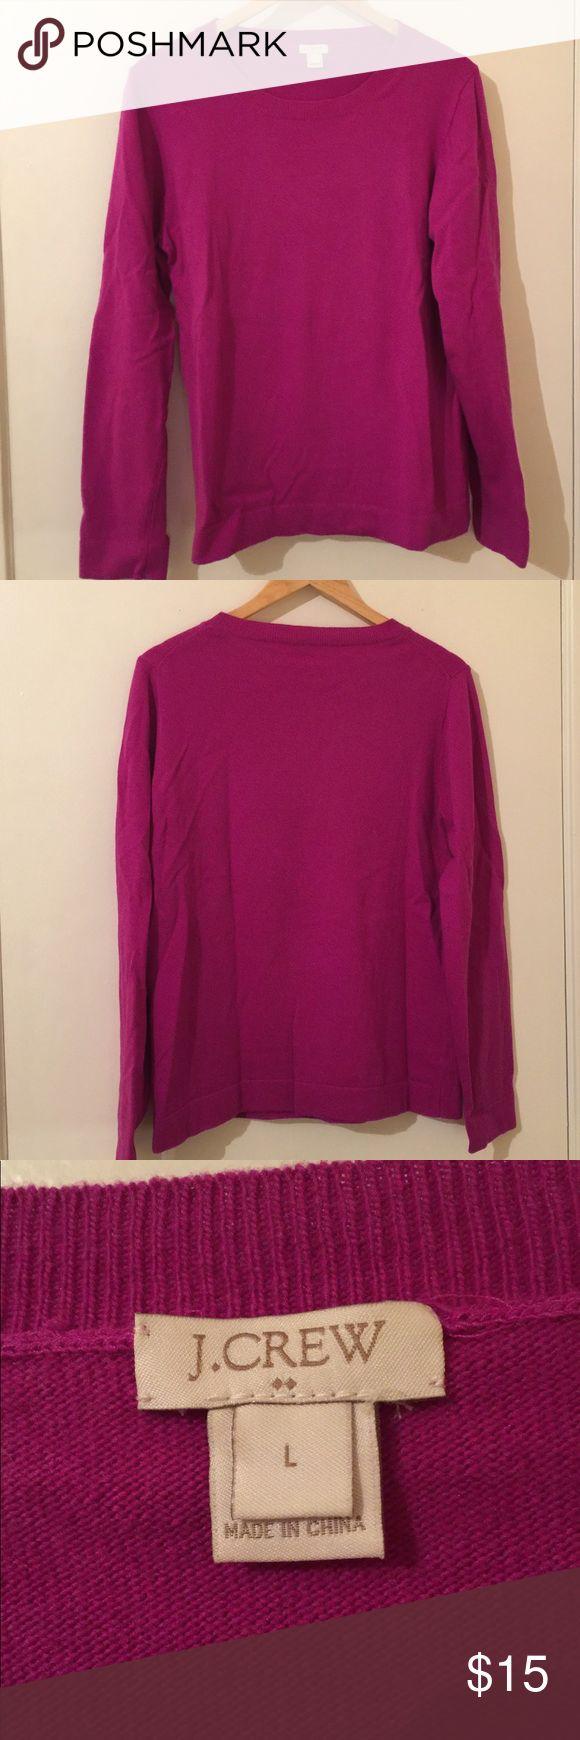 J Crew Purple Sweater Purple J Crew Teddie Sweater. EUC, size Large. J. Crew Factory Sweaters